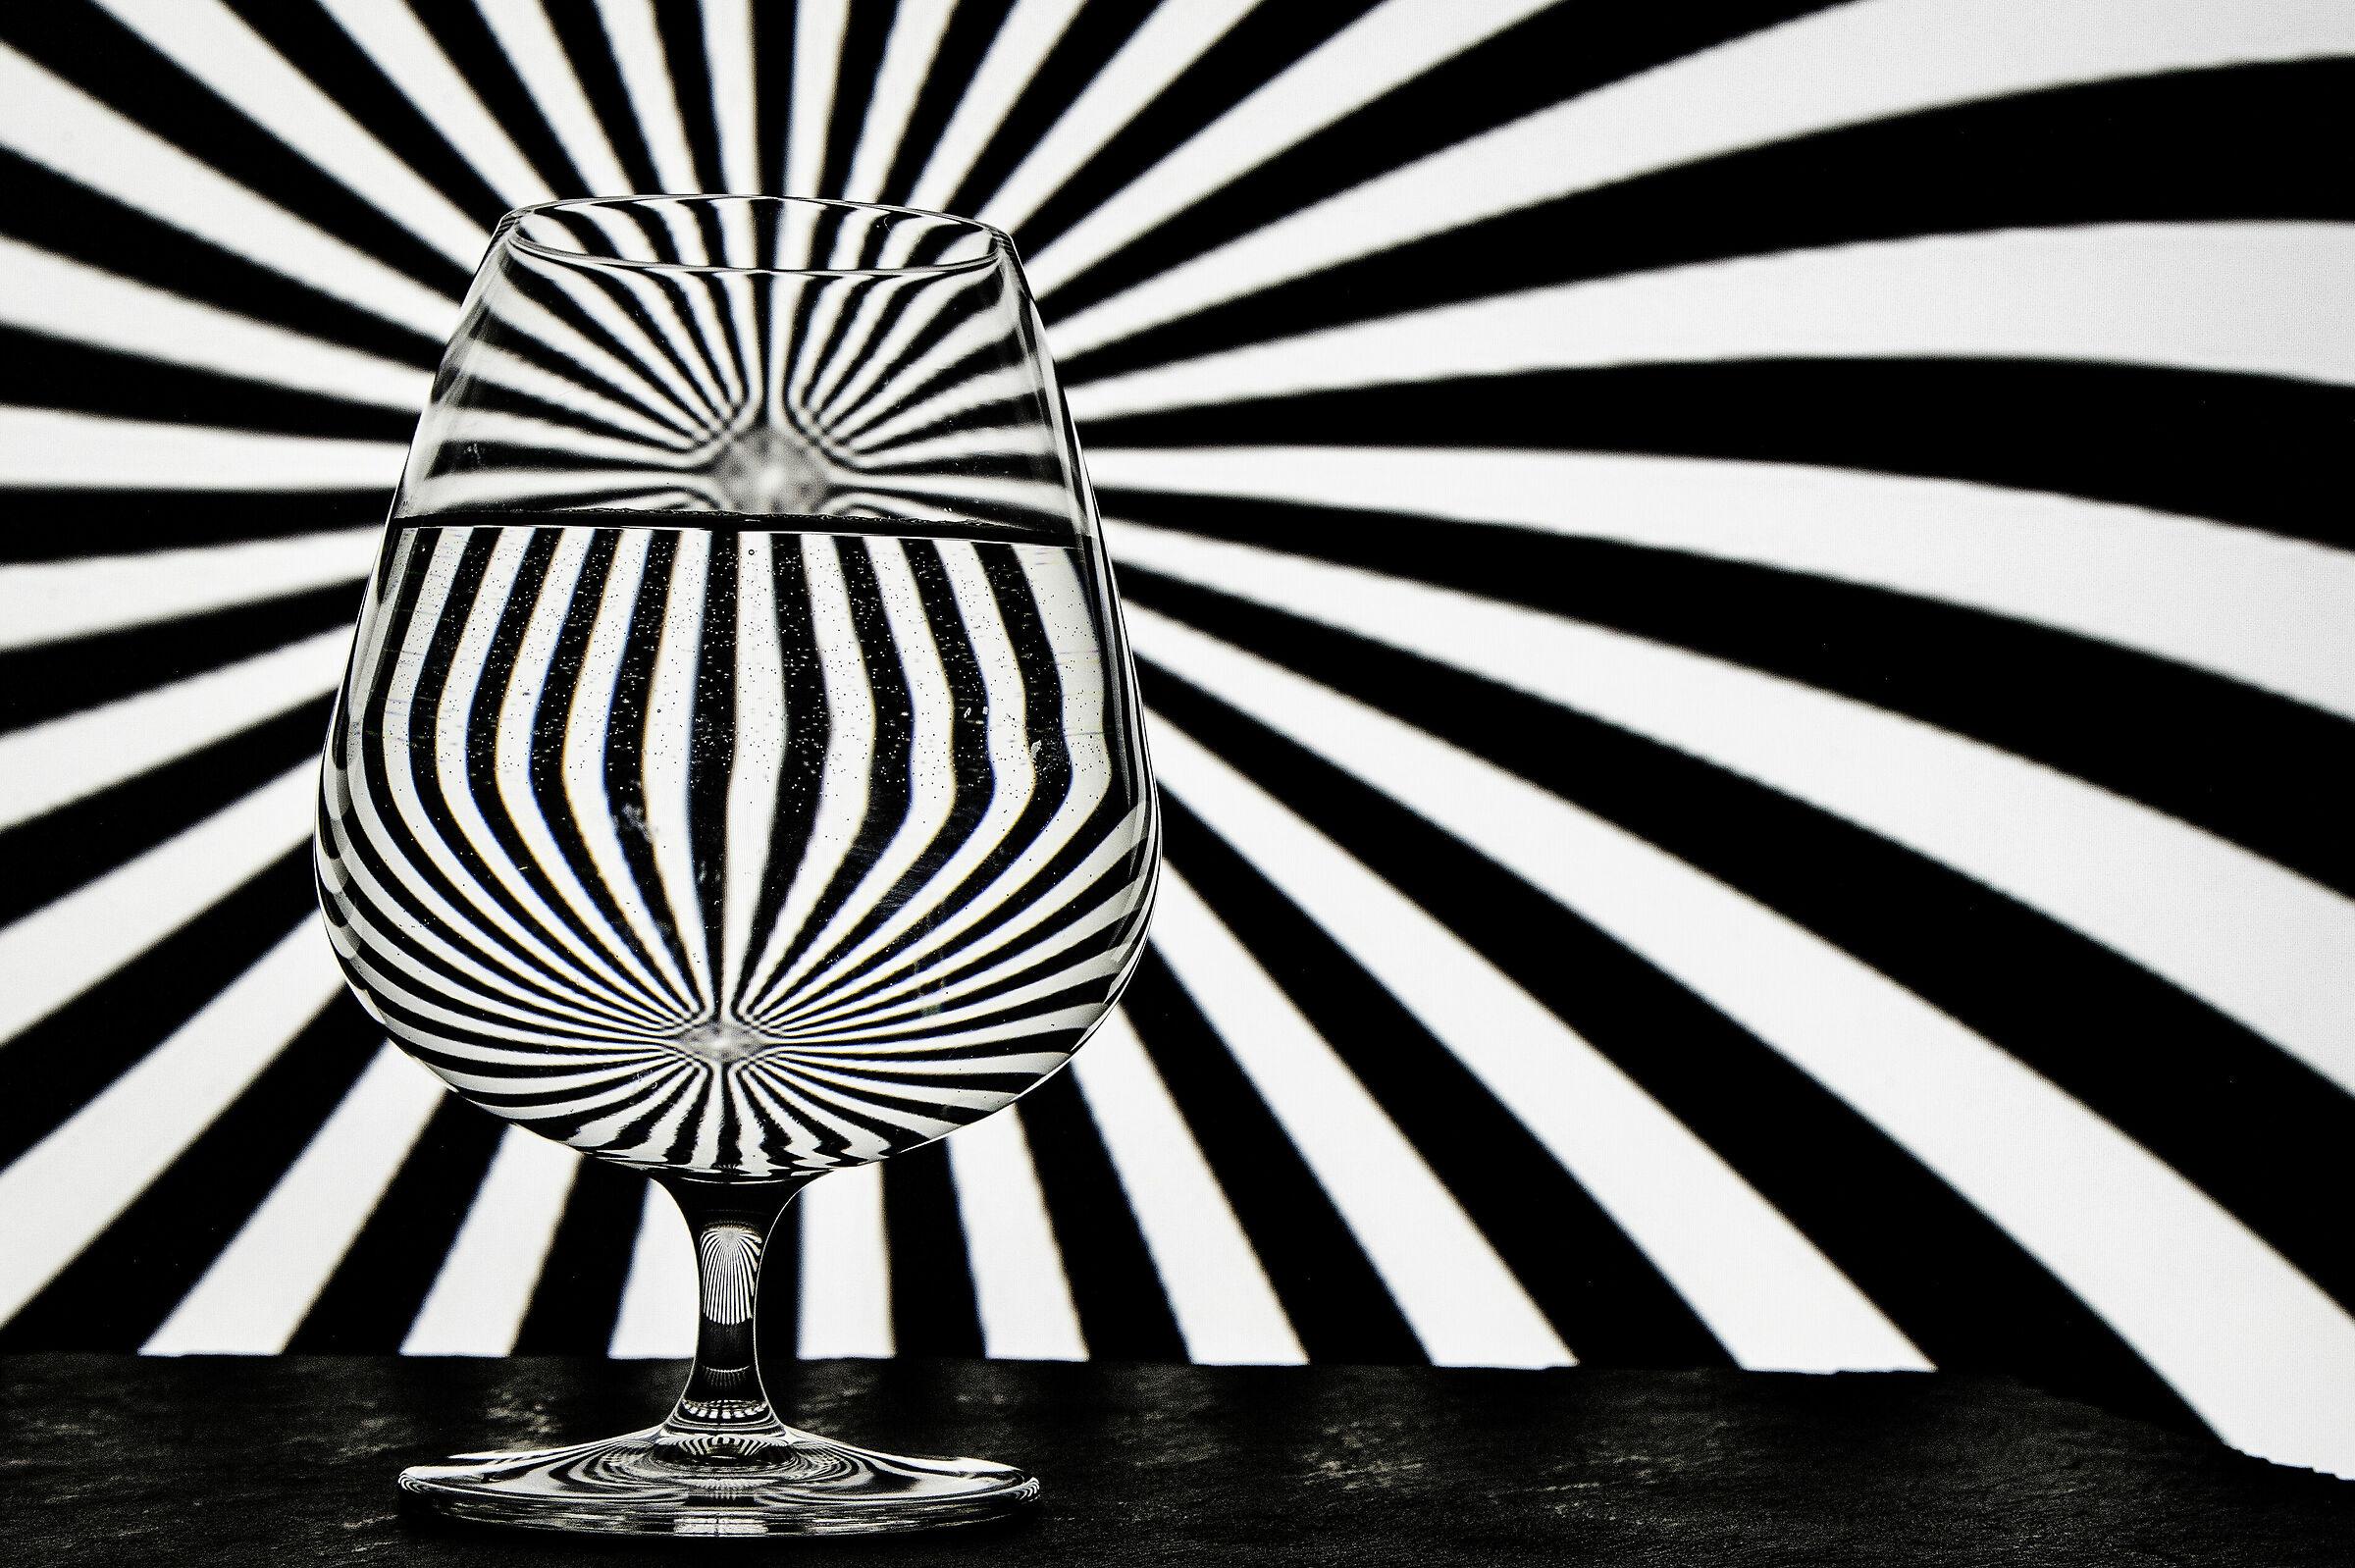 Hypnotic...